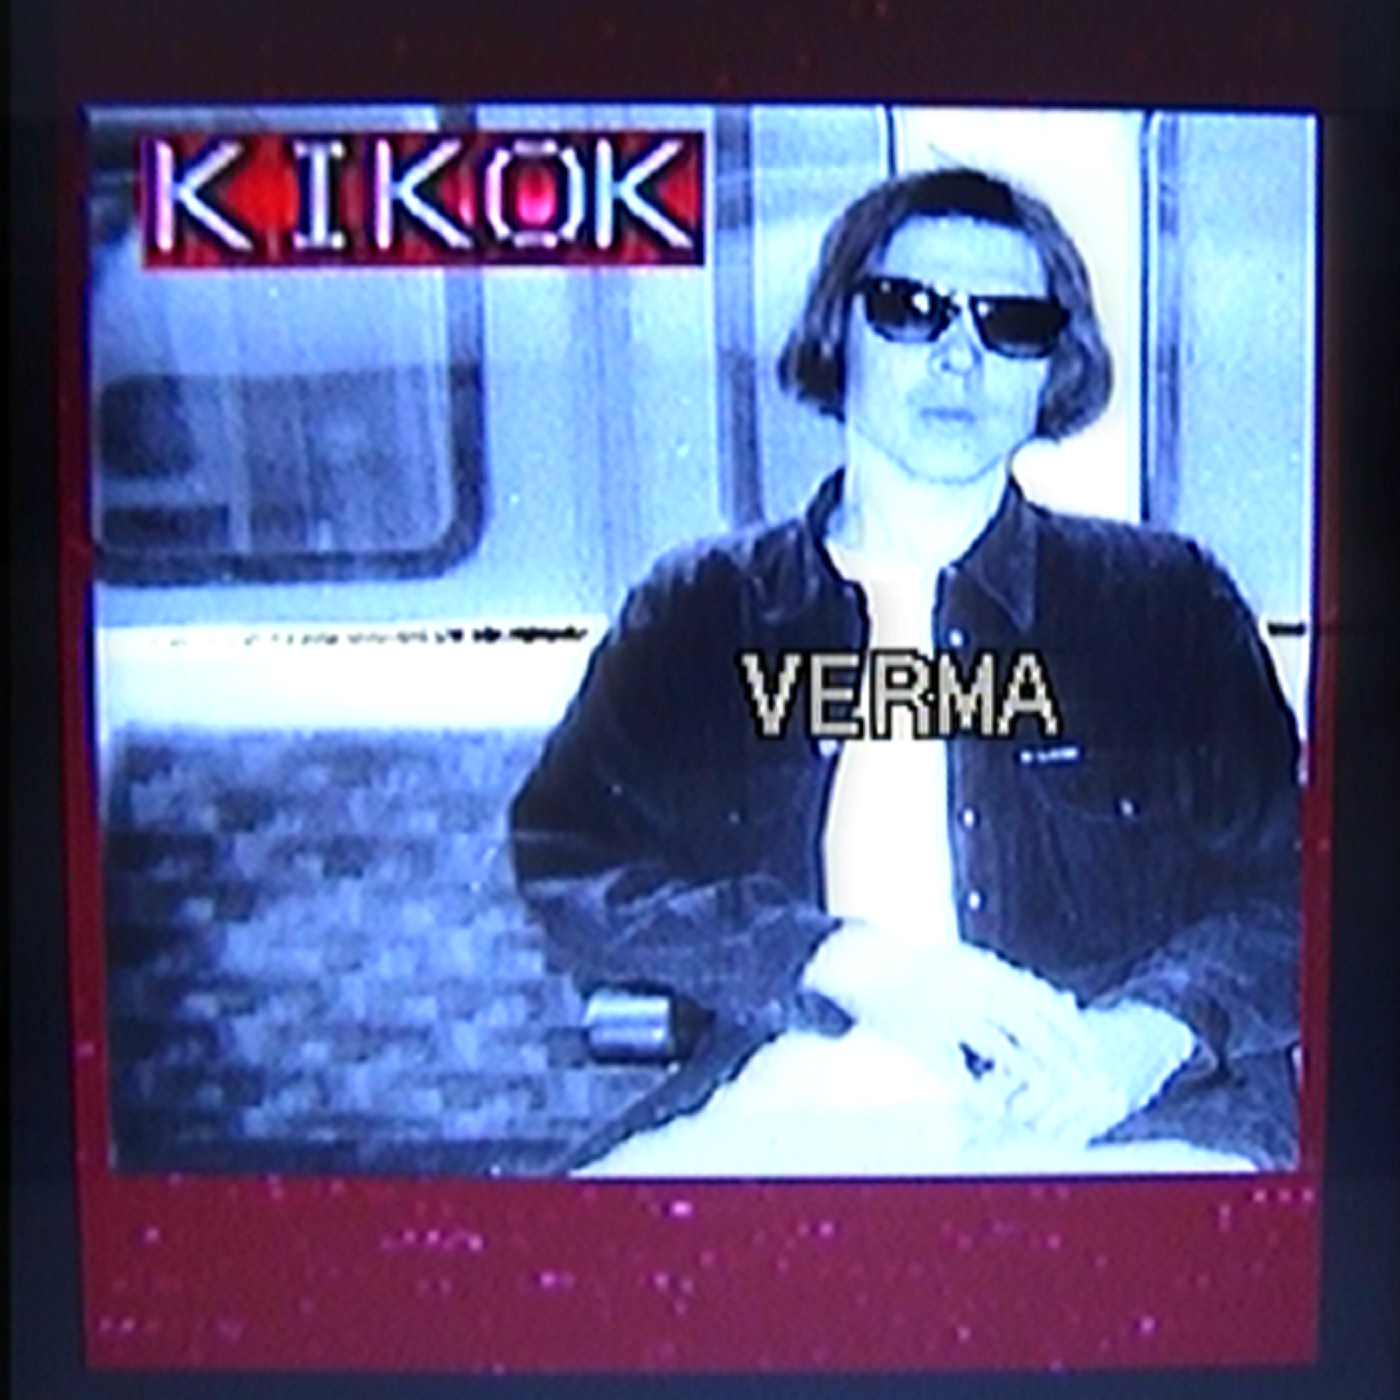 verma-1400h1400